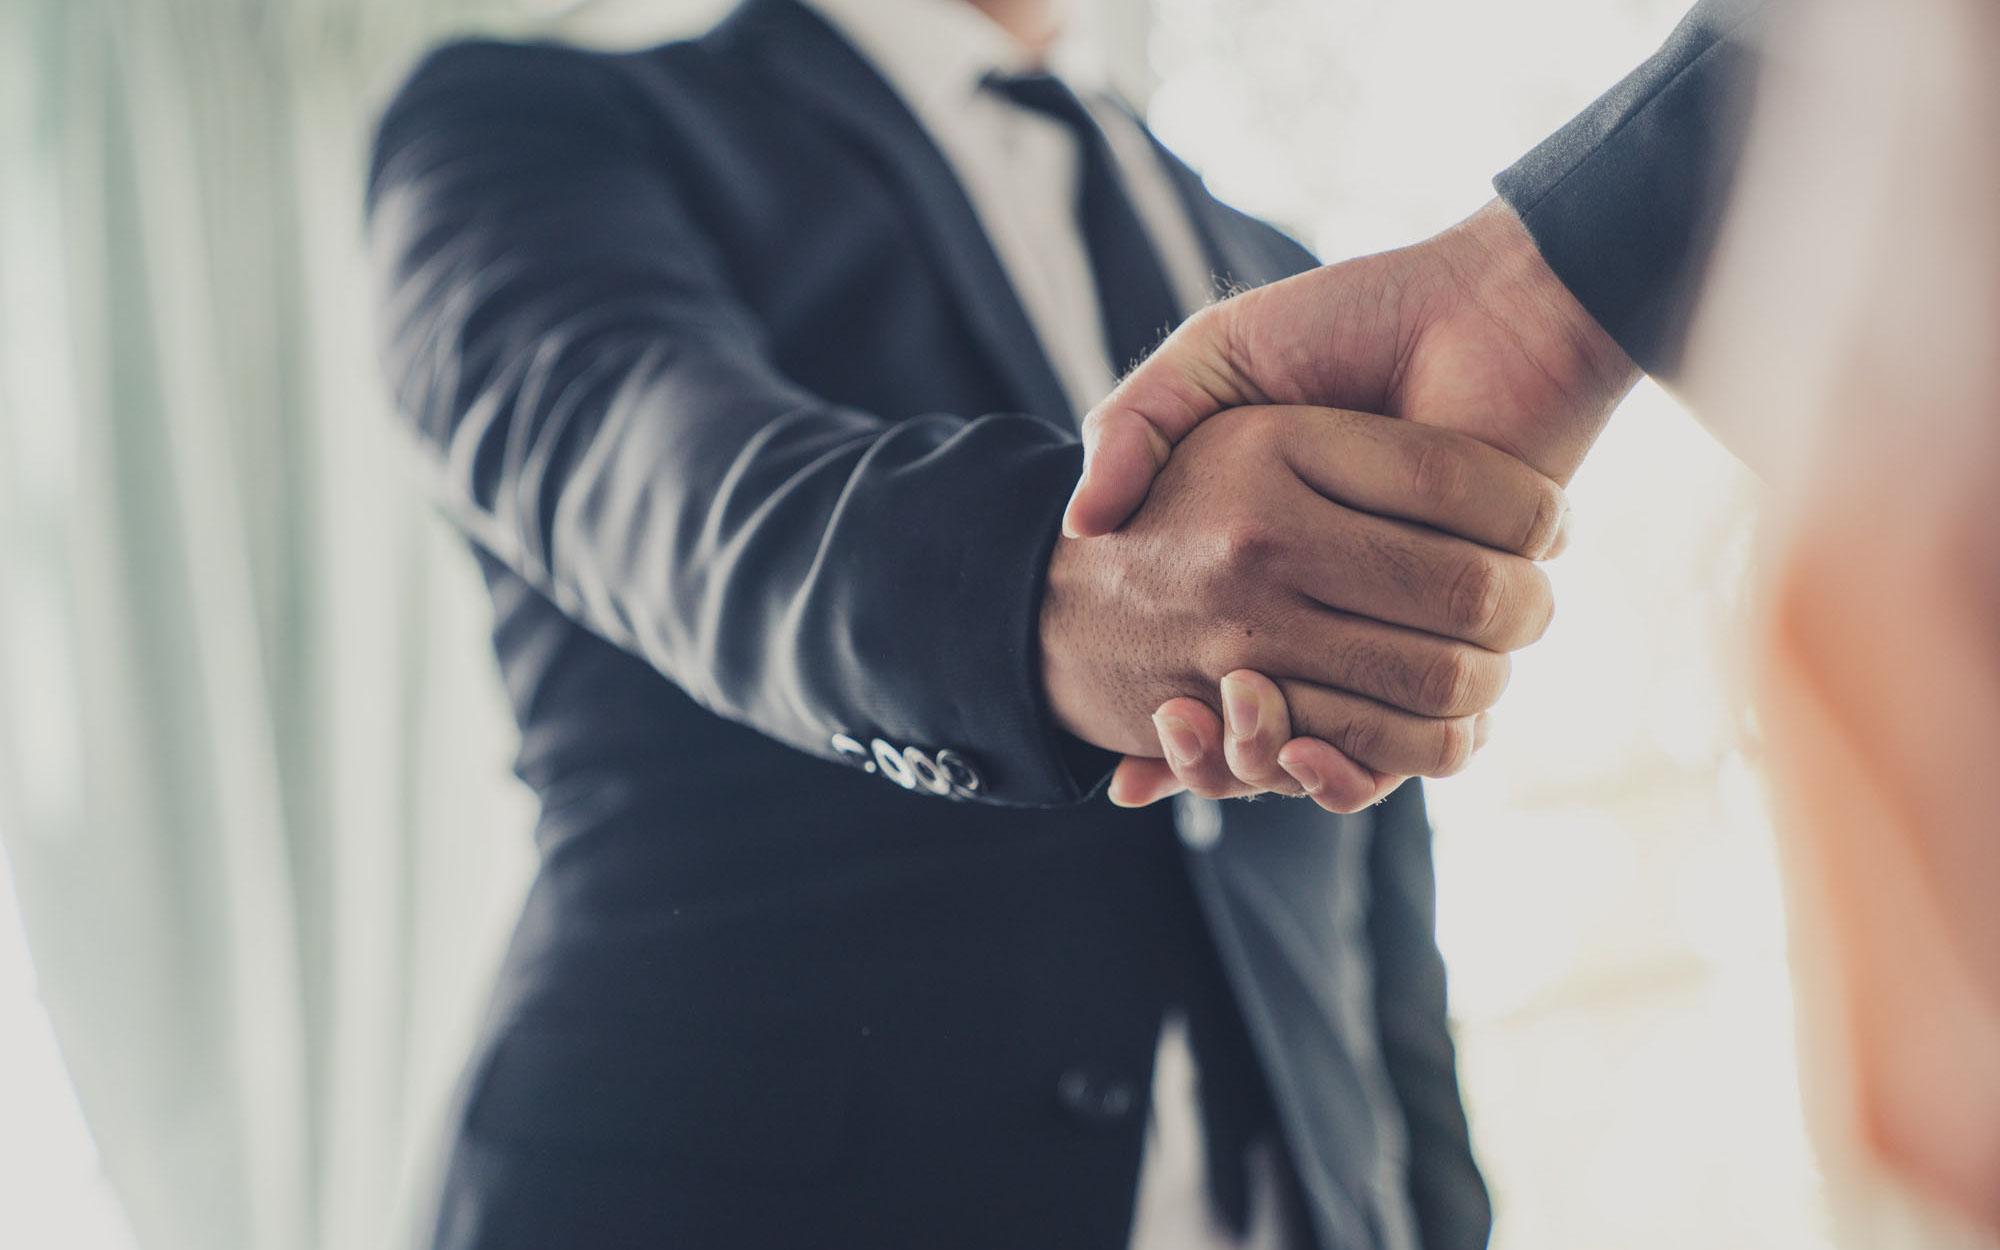 man in suit shaking hands